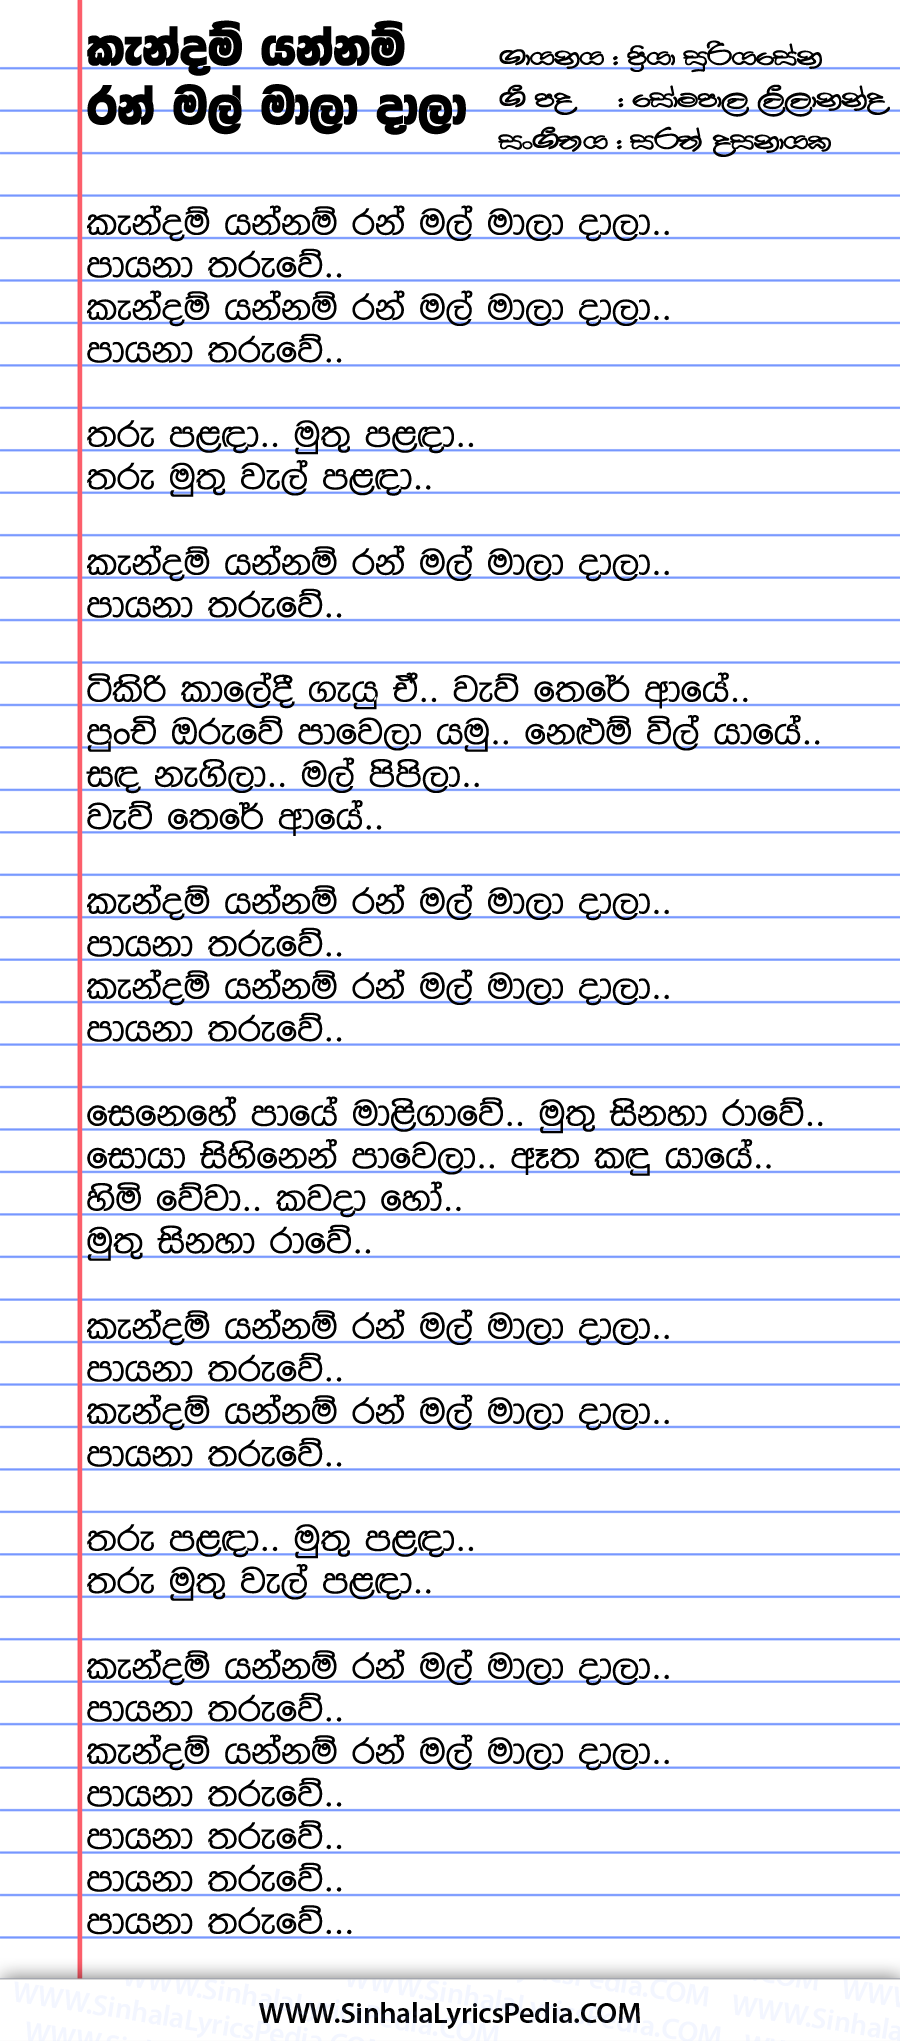 Kandan Yannam Ranwan Mala Dala Song Lyrics